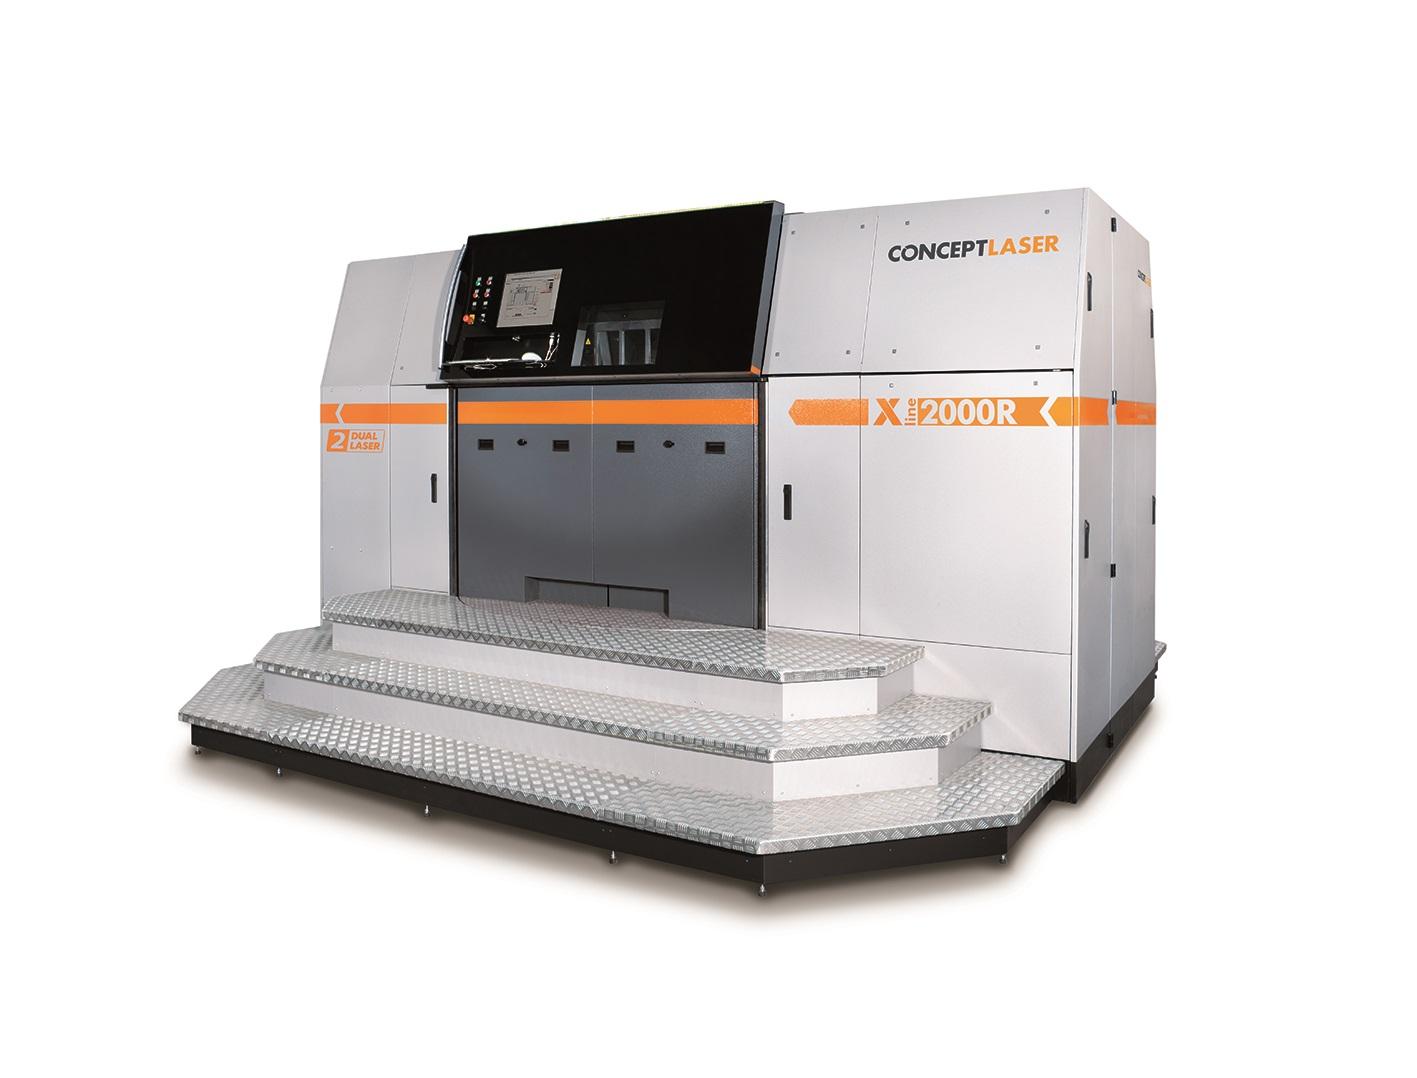 X line 2000R Image: Concept Laser